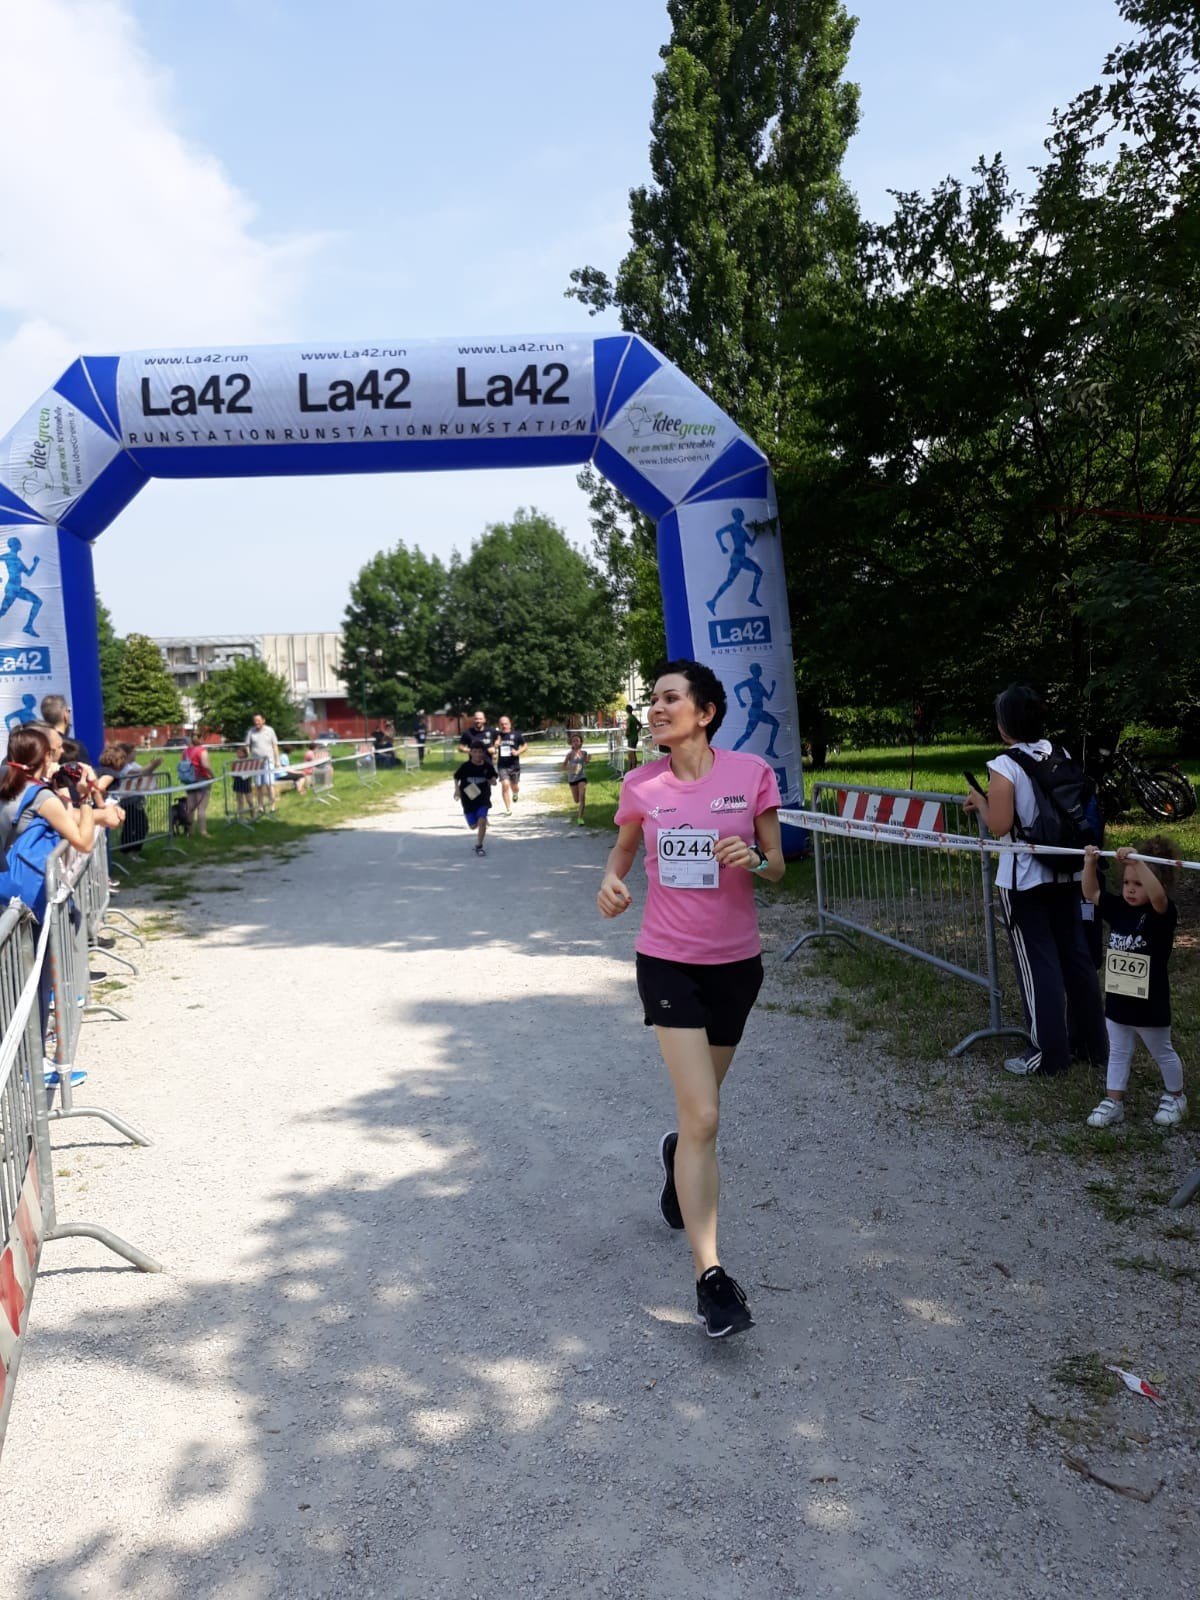 Rete del Dono - Pink is Good - Running Team